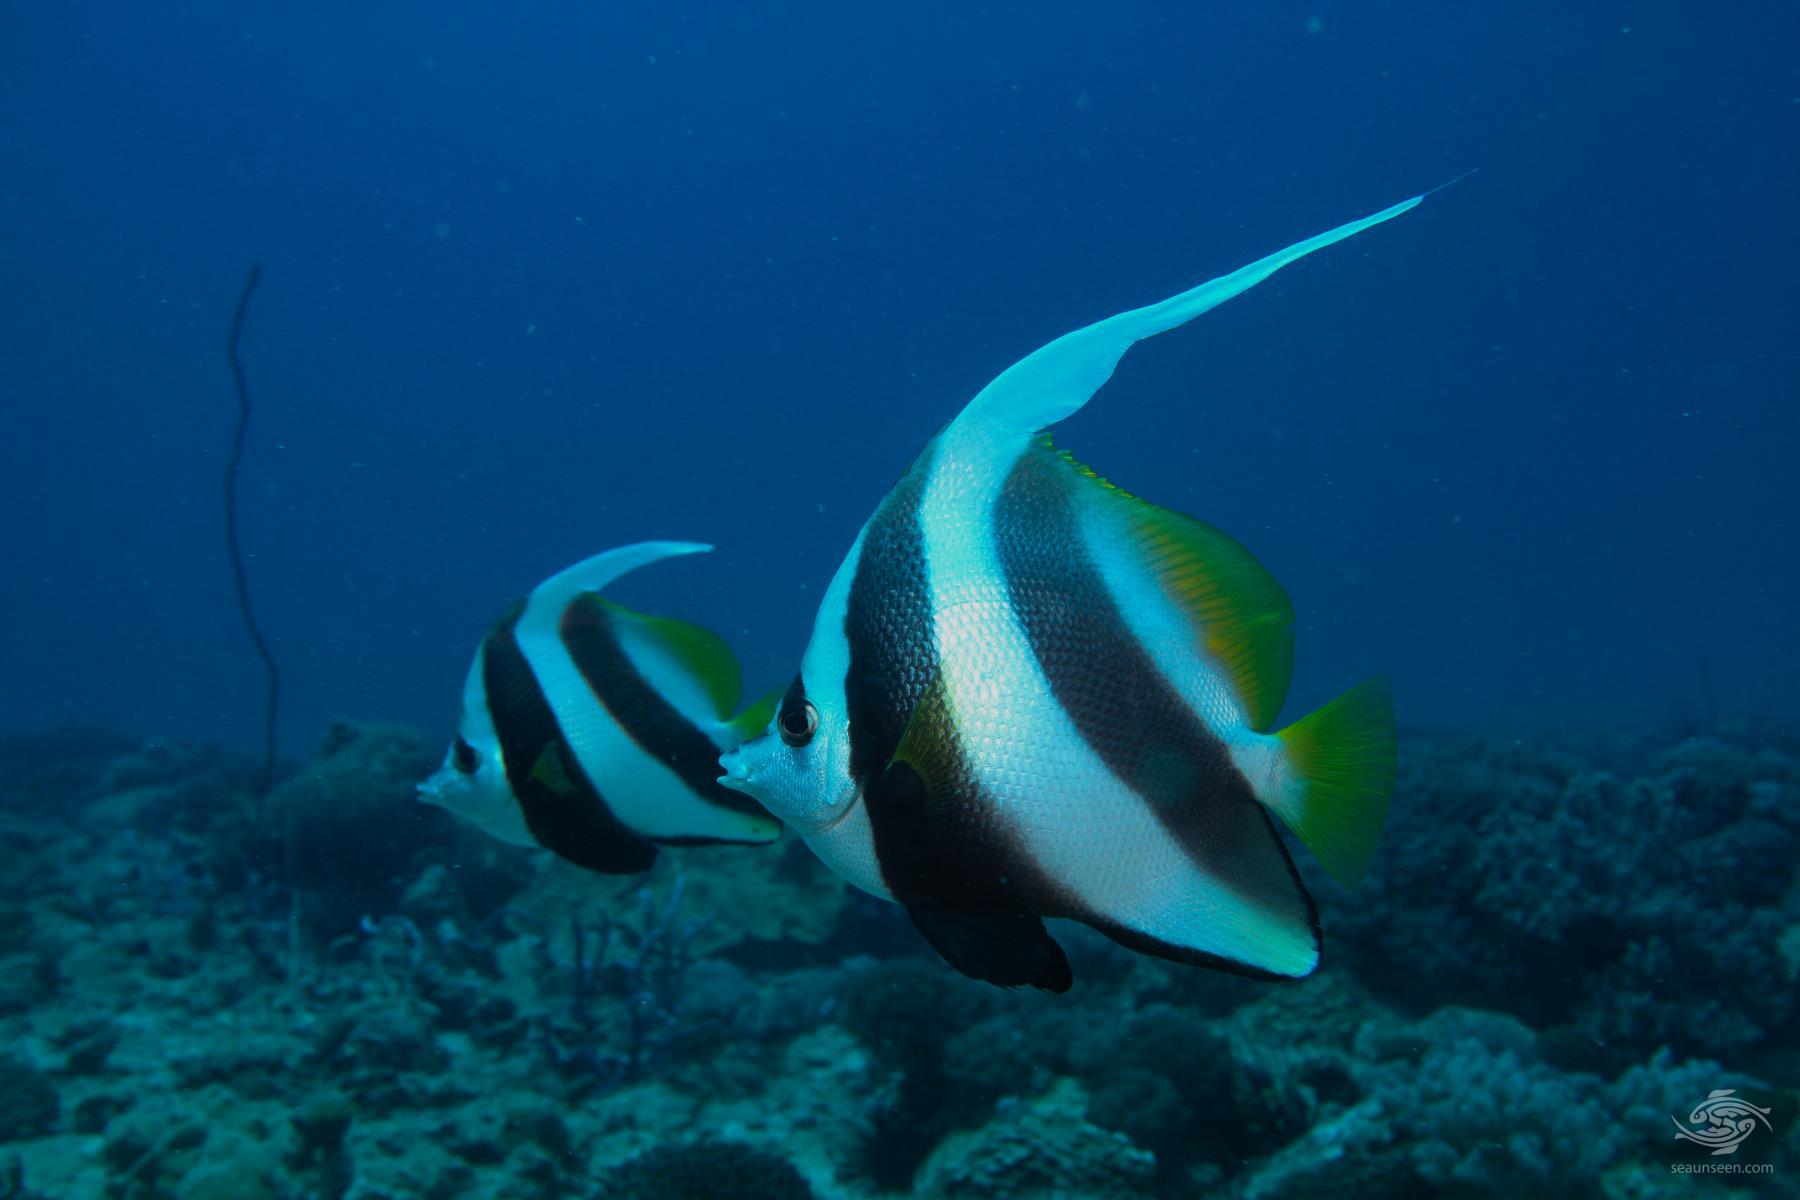 Longfin A pair of longfin bannerfish Heniochus acuminatus on Kankadya reef Tanzania